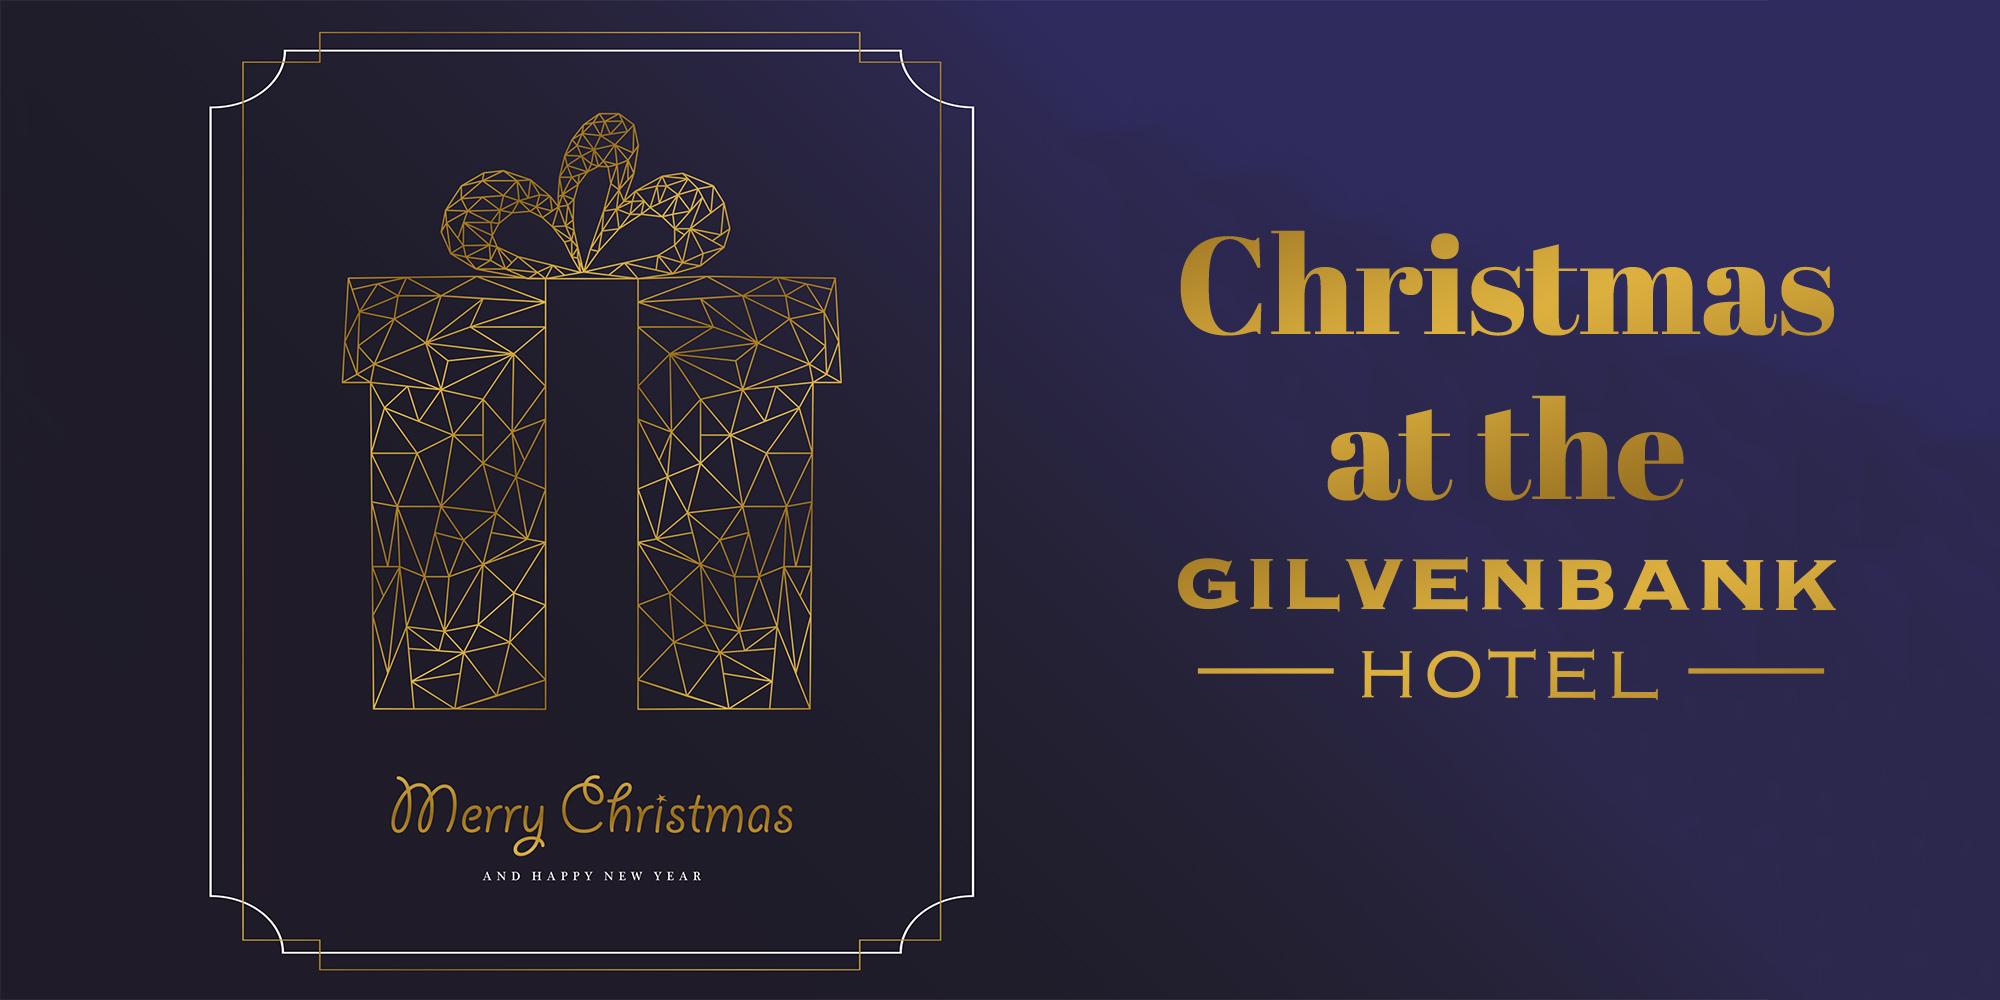 Christmas Party Nights and Hogmanay at the Gilvenbank Hotel Glenrothes